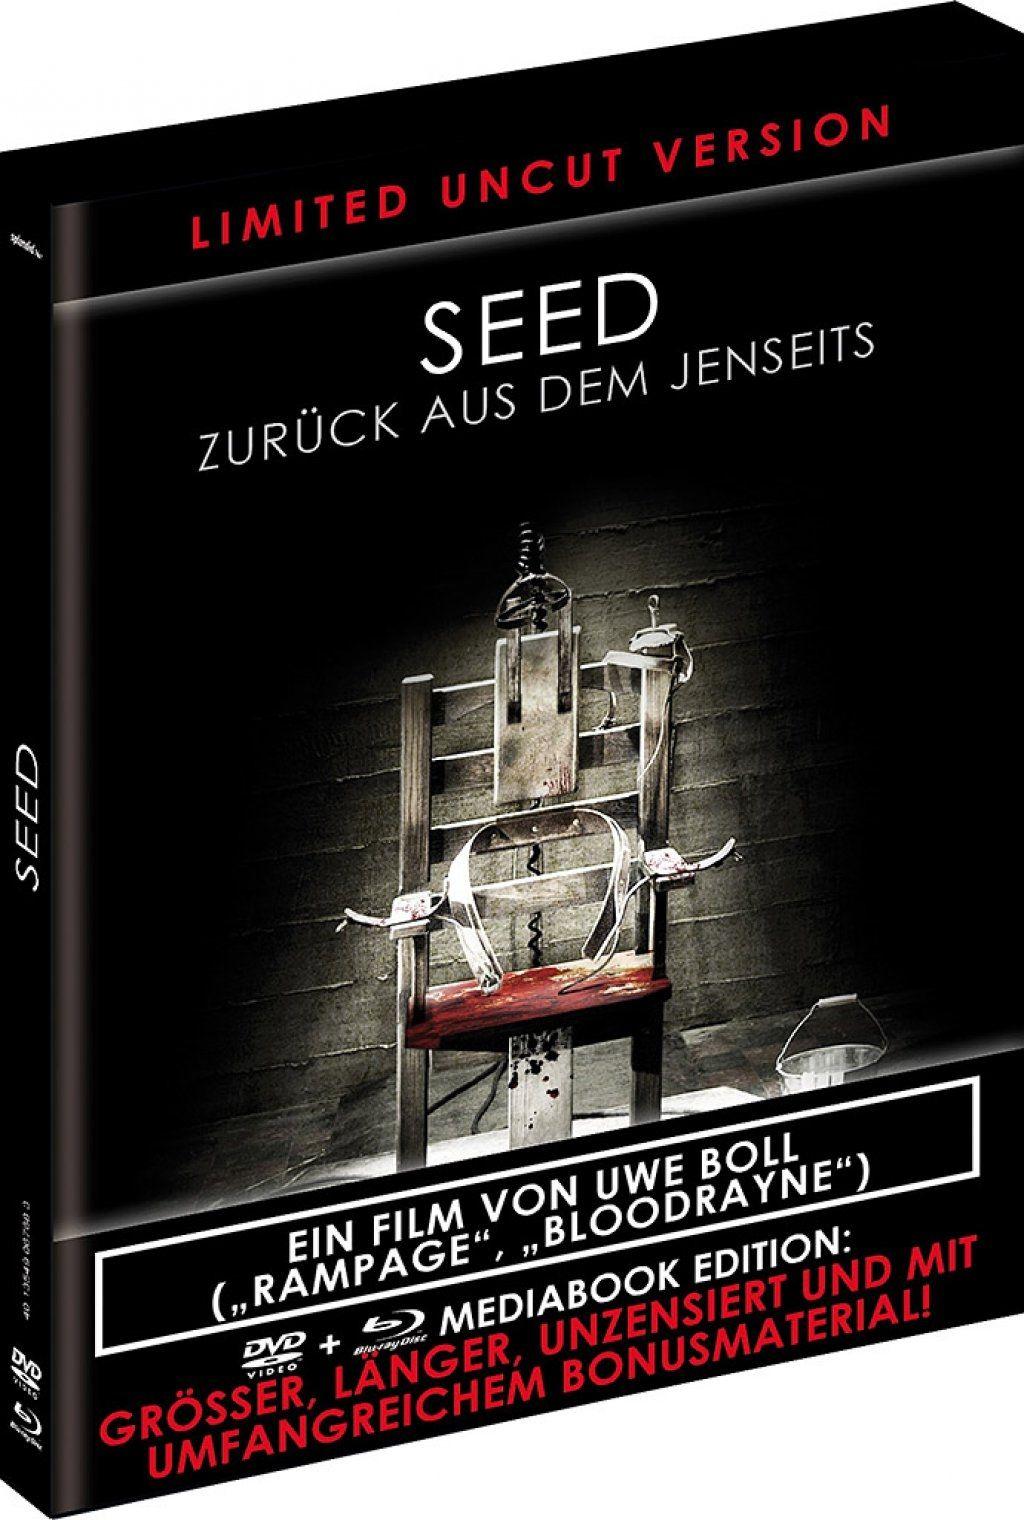 Seed - Zurück aus dem Jenseits (Uncut) (Black Book Edition) (DVD + BLURAY)